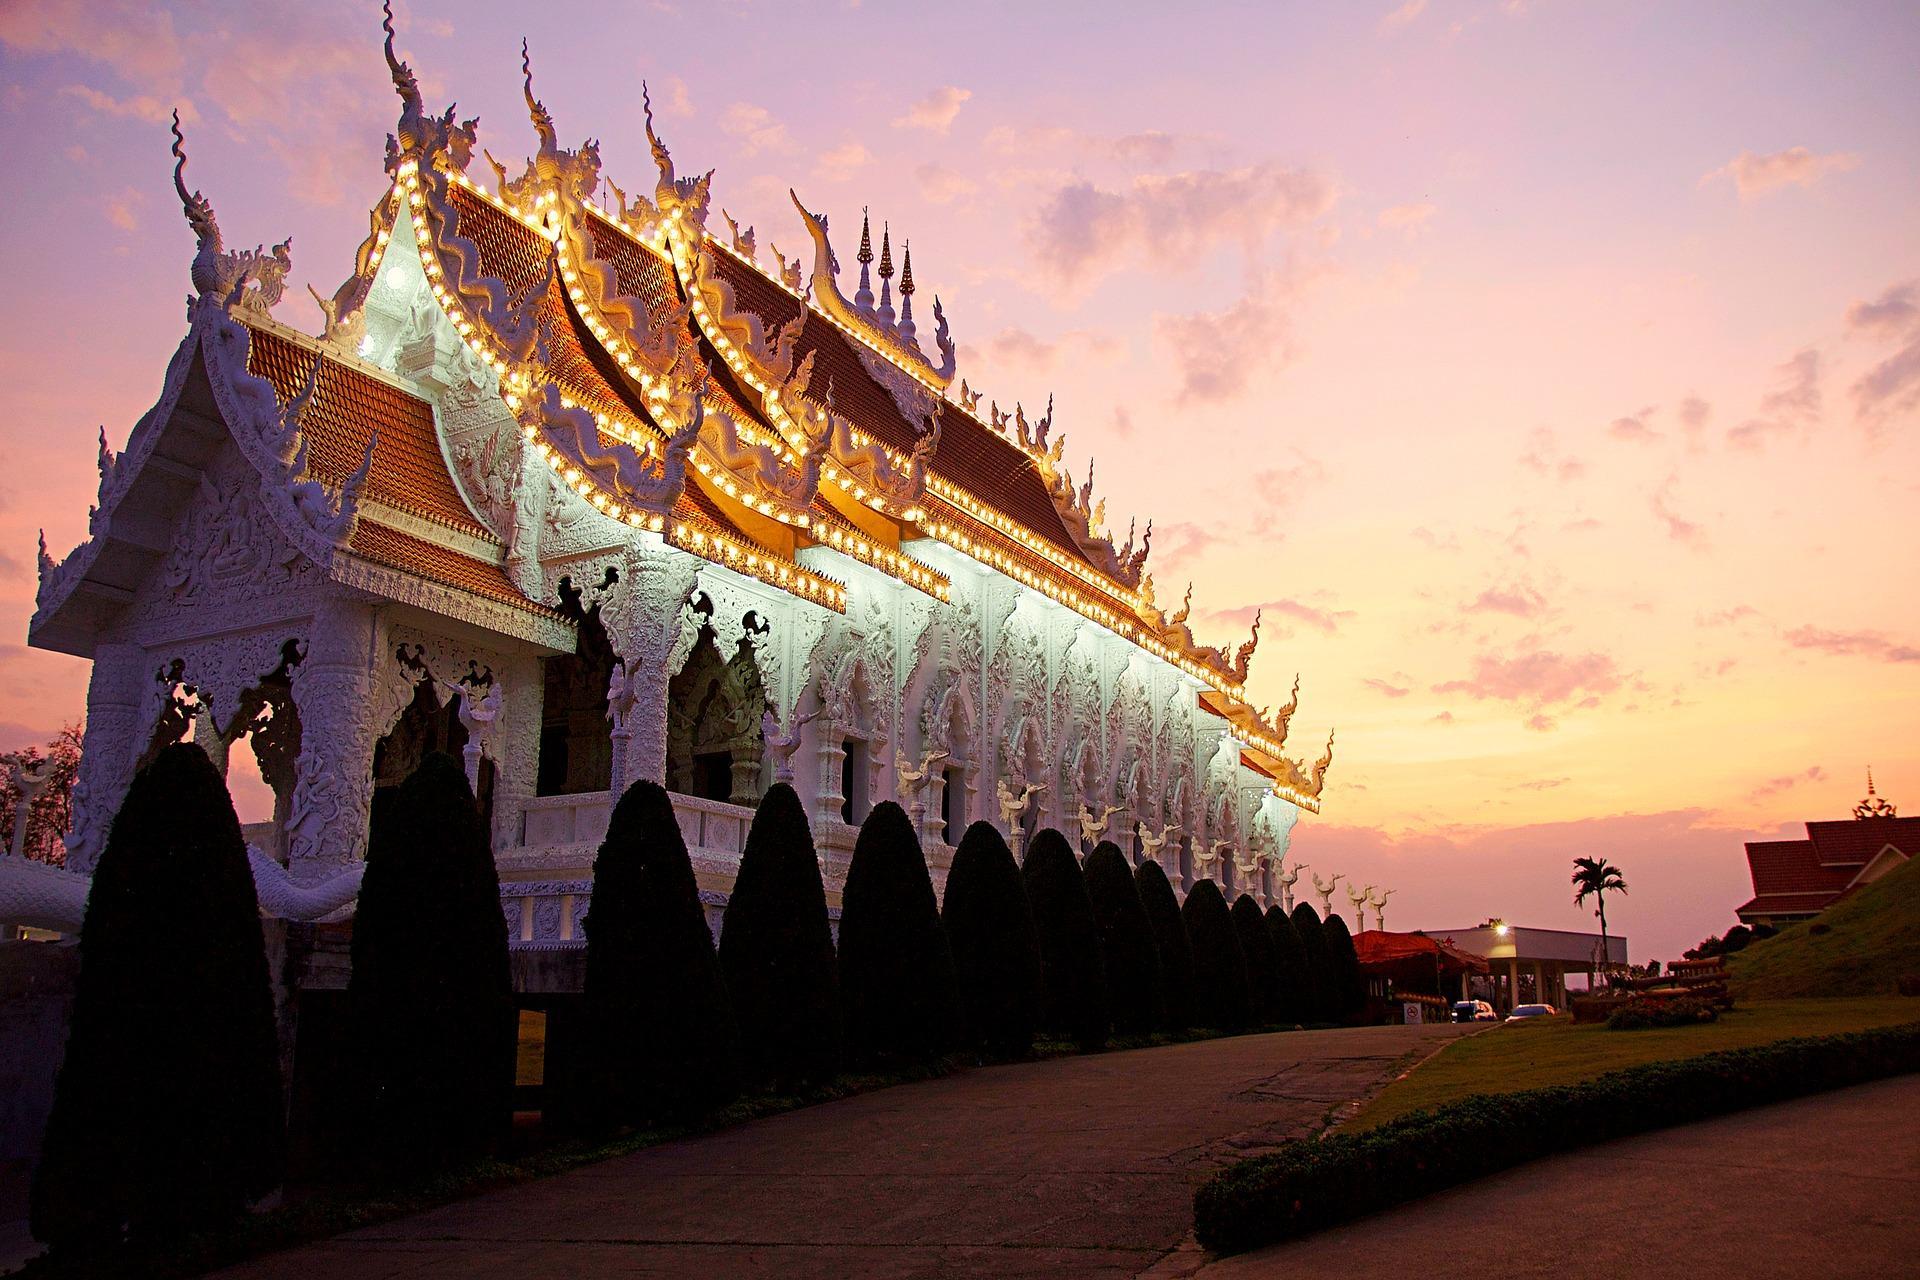 /optitravel/online/www/layout22/single_product.php?pkt_id=145&Produto=Bangkok, Maravilhas do Norte (Regular) & Krabi&destino=TAILÂNDIA